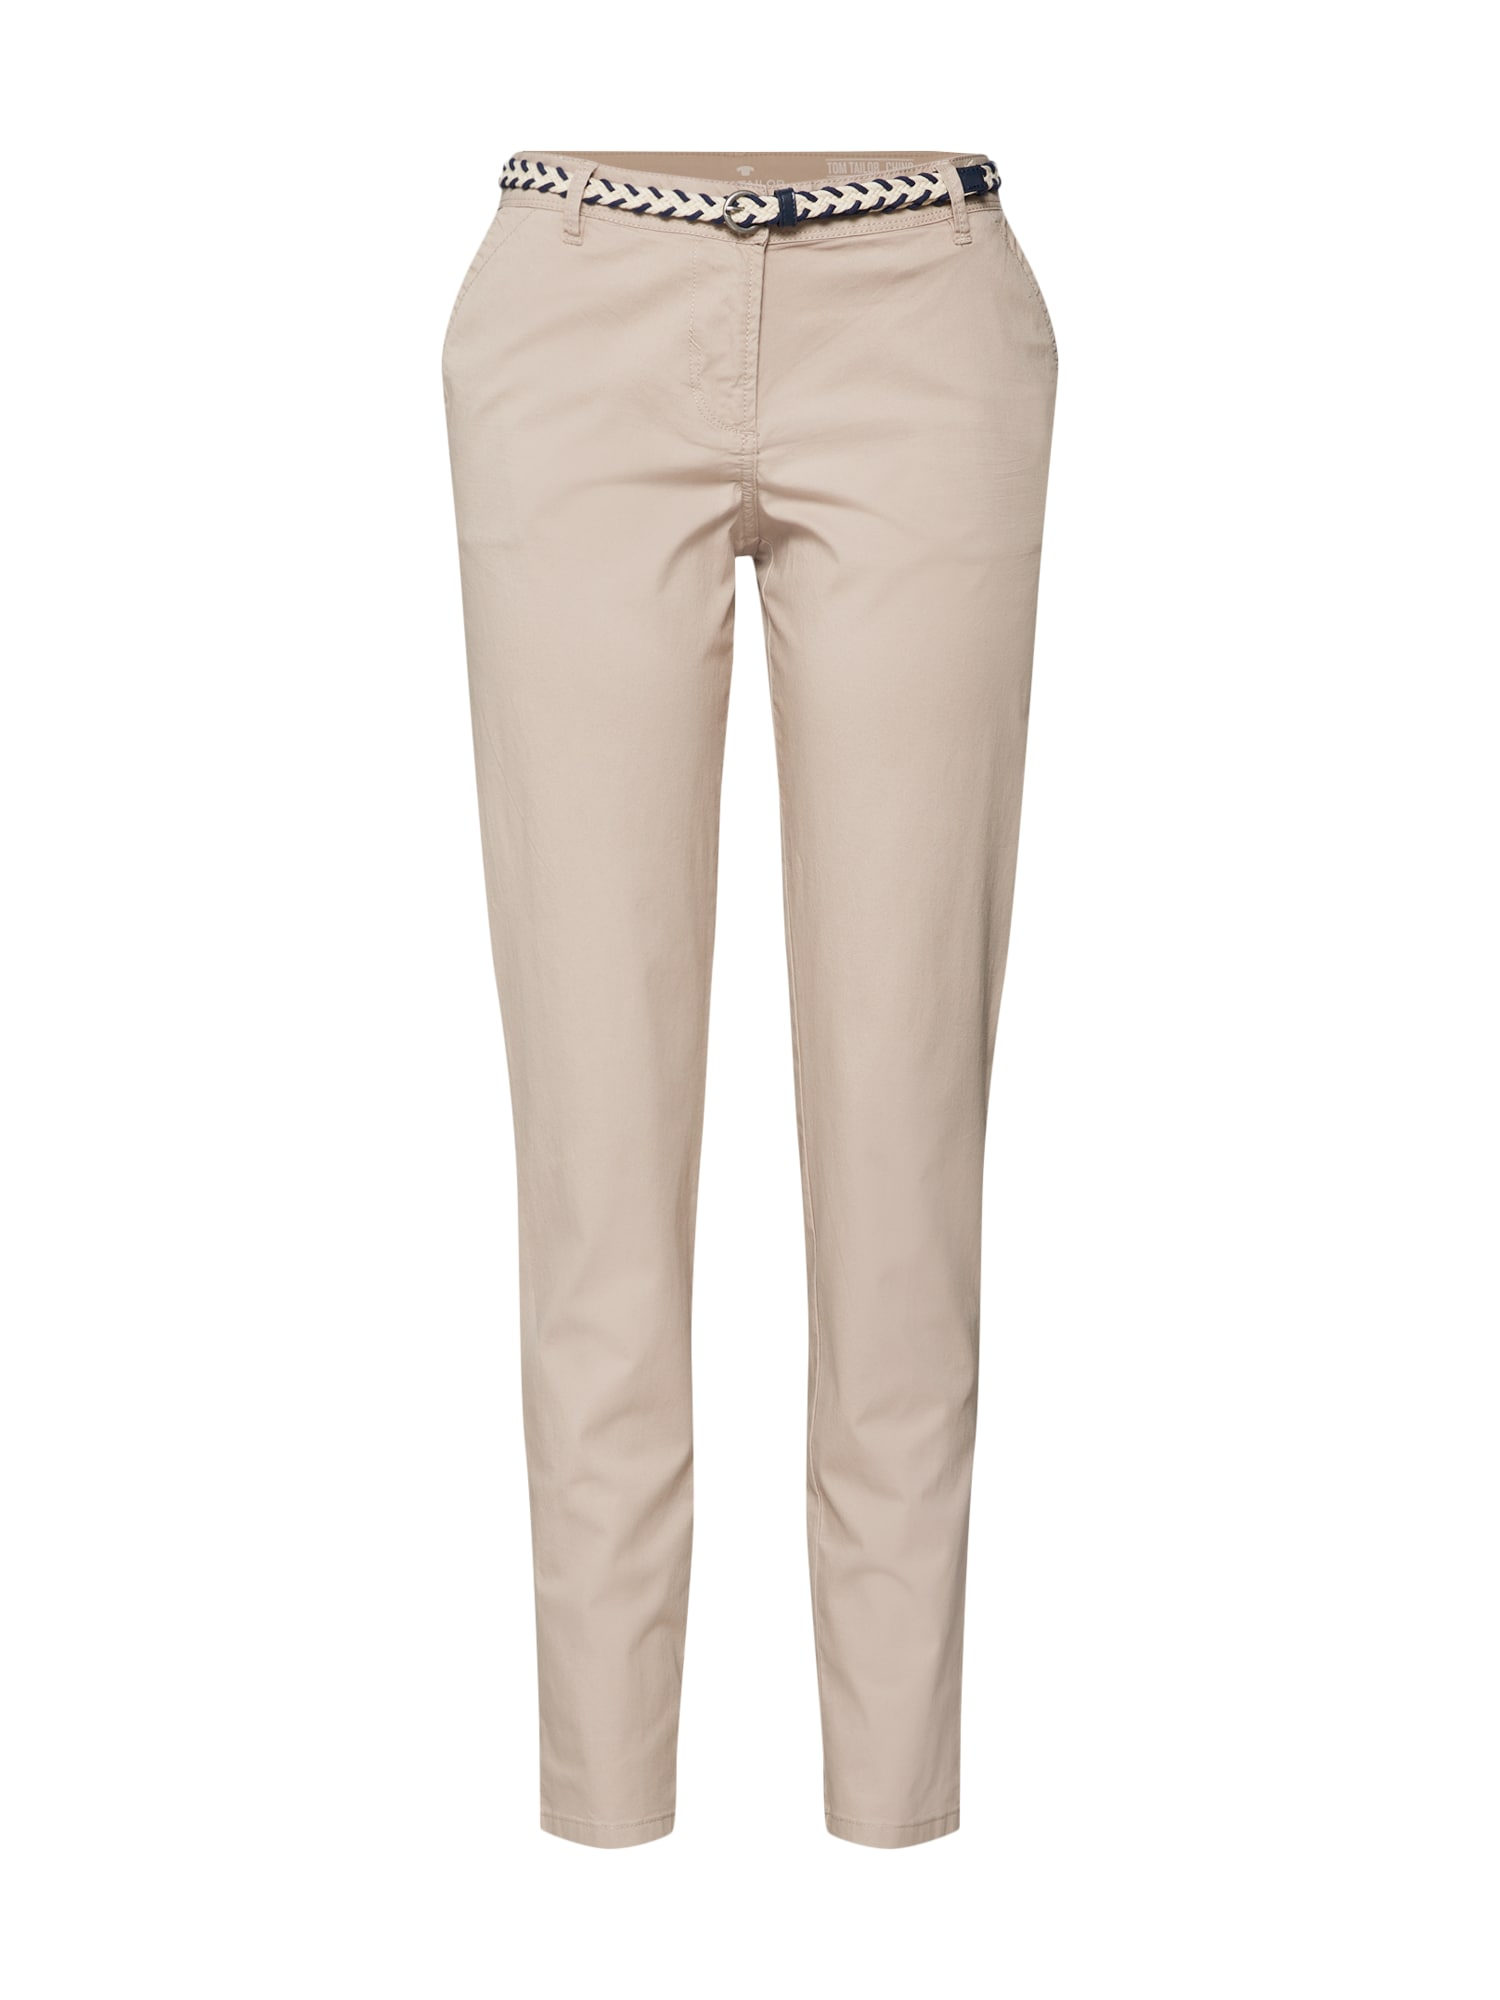 Chino kalhoty velbloudí TOM TAILOR